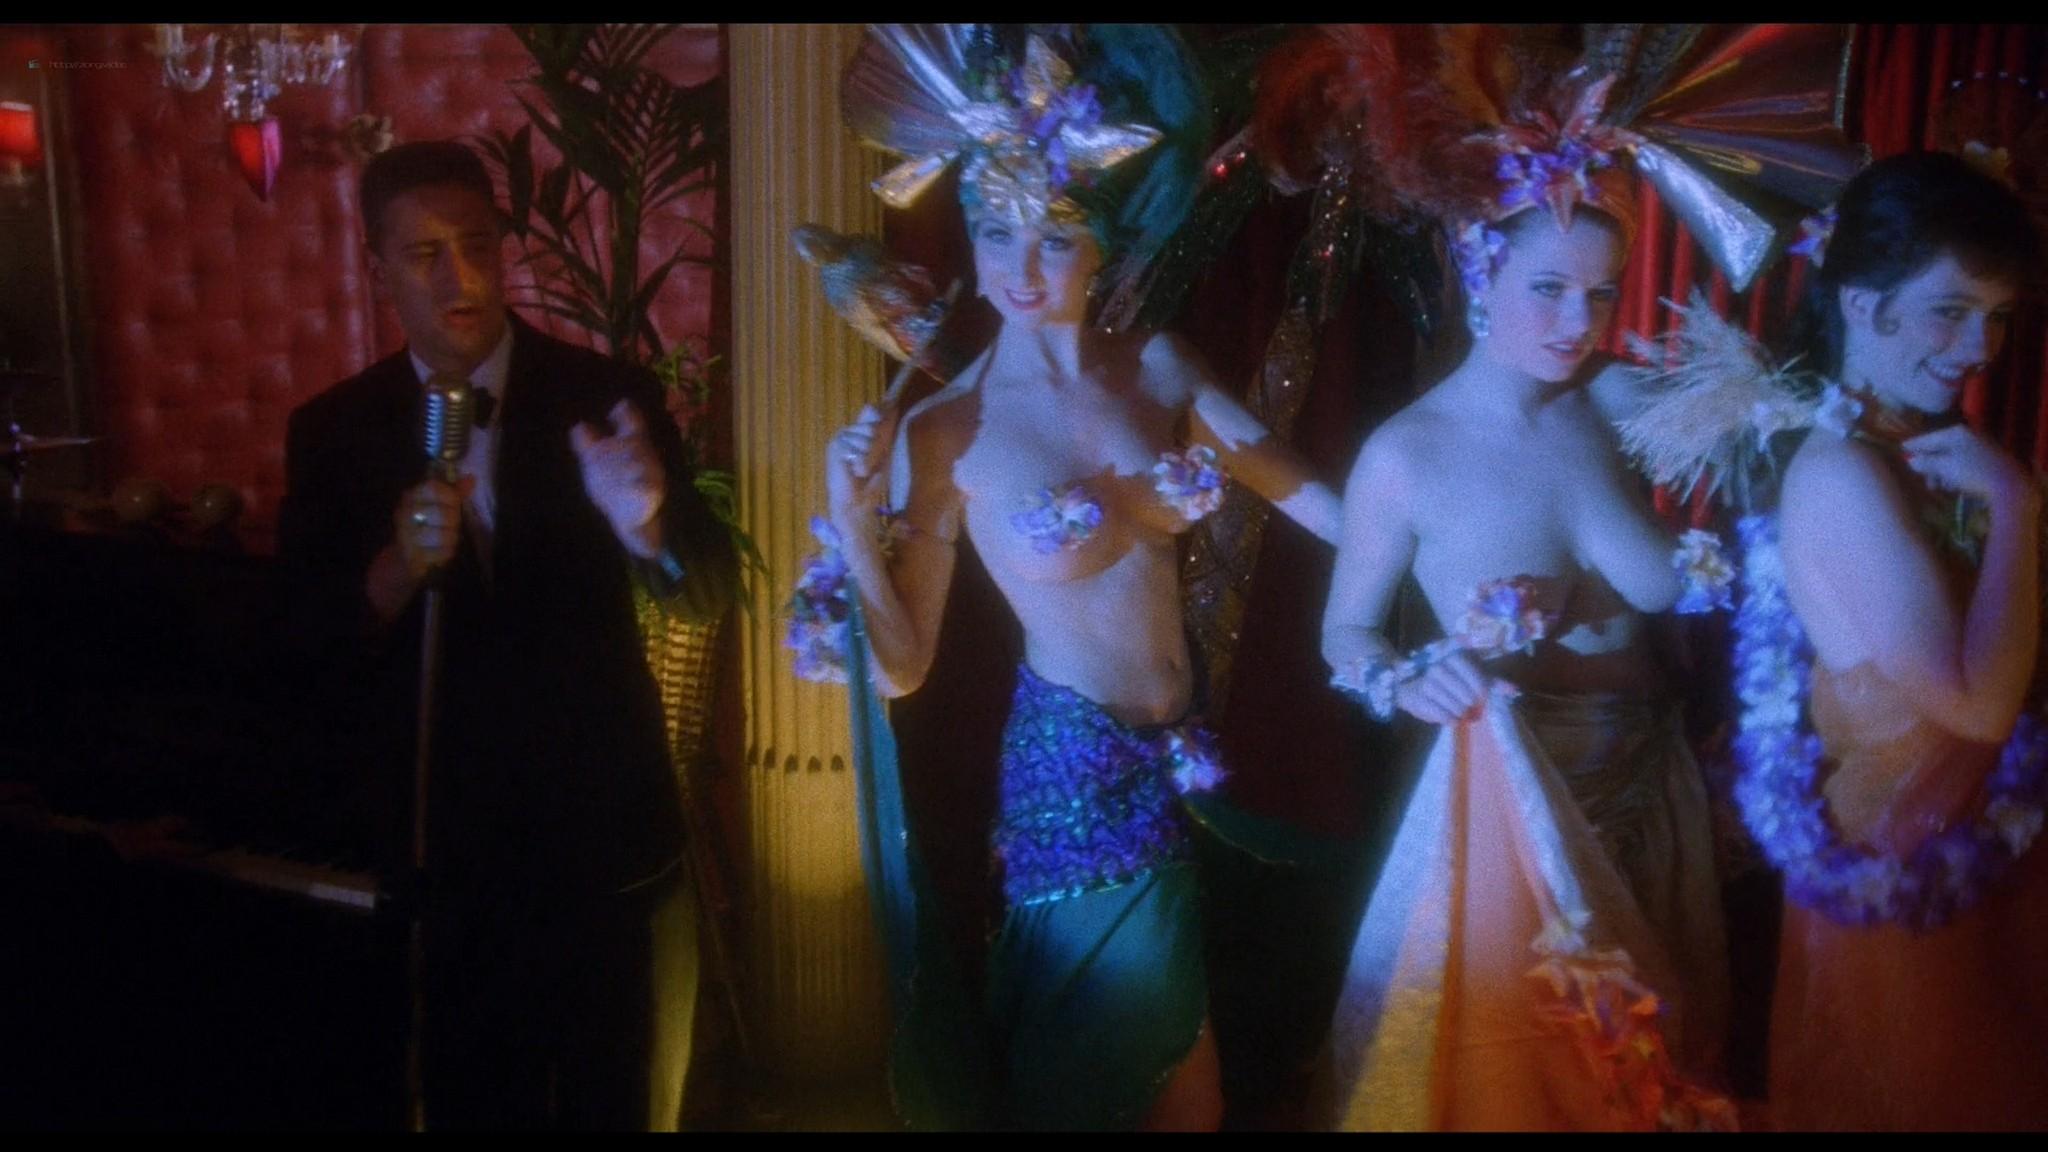 Bridget Fonda nude butt boobs Britt Ekland nude Joanne Whalley hot - Scandal (1989) HD 1080p BluRay (19)